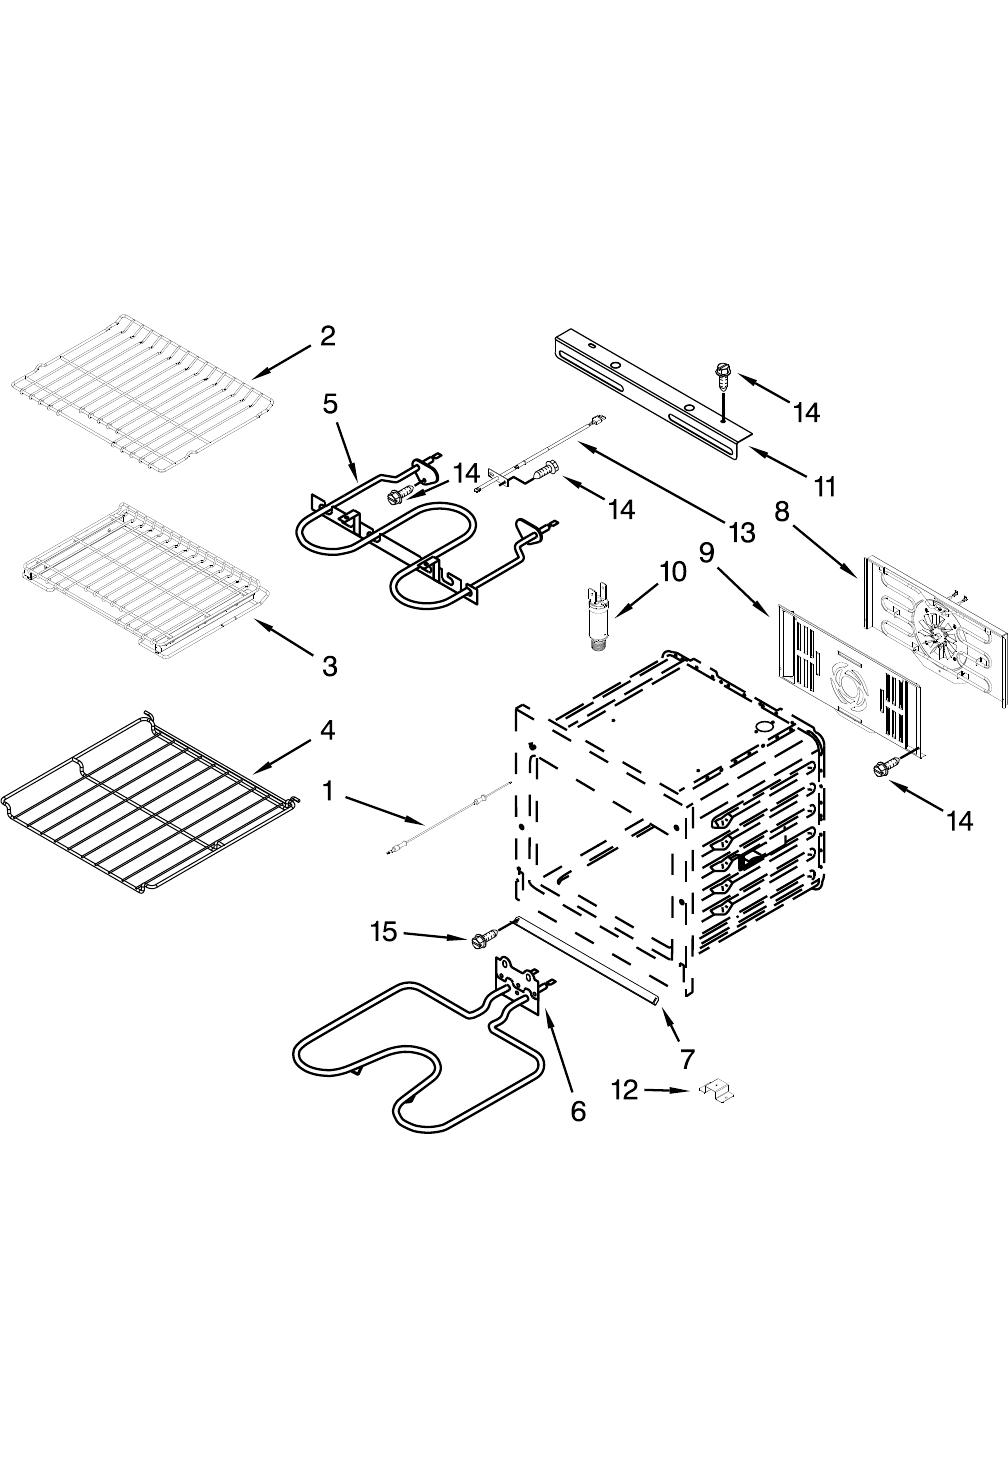 Jennair Jenn Air Microwave Oven Jmw2430Wb00 Users Manual